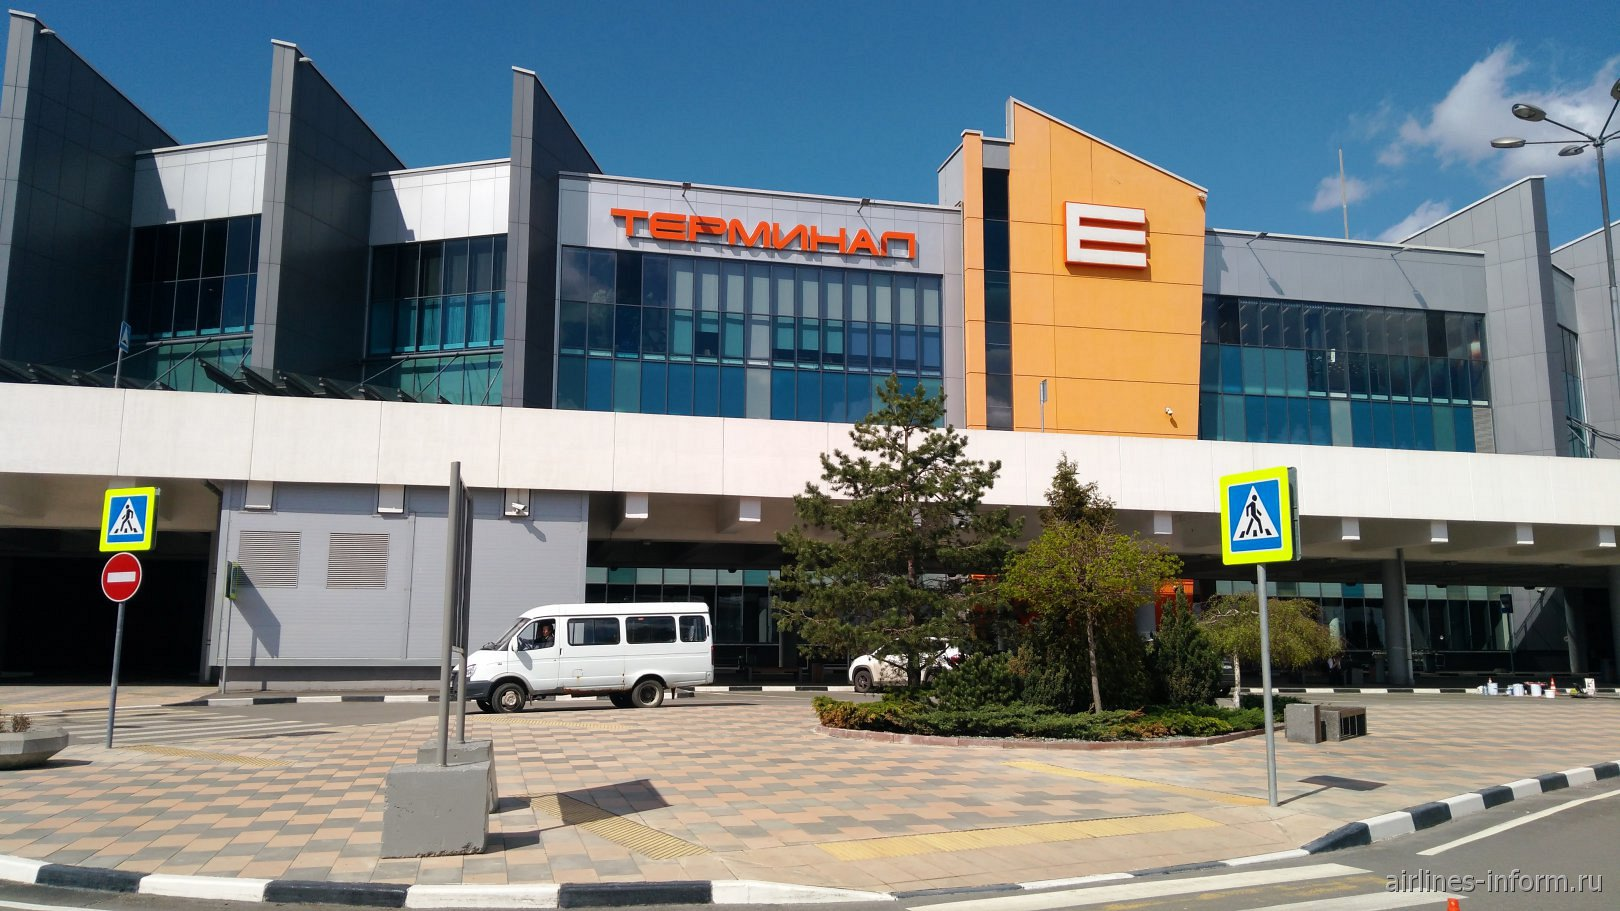 Терминал E аэропорта Москва Шереметьево